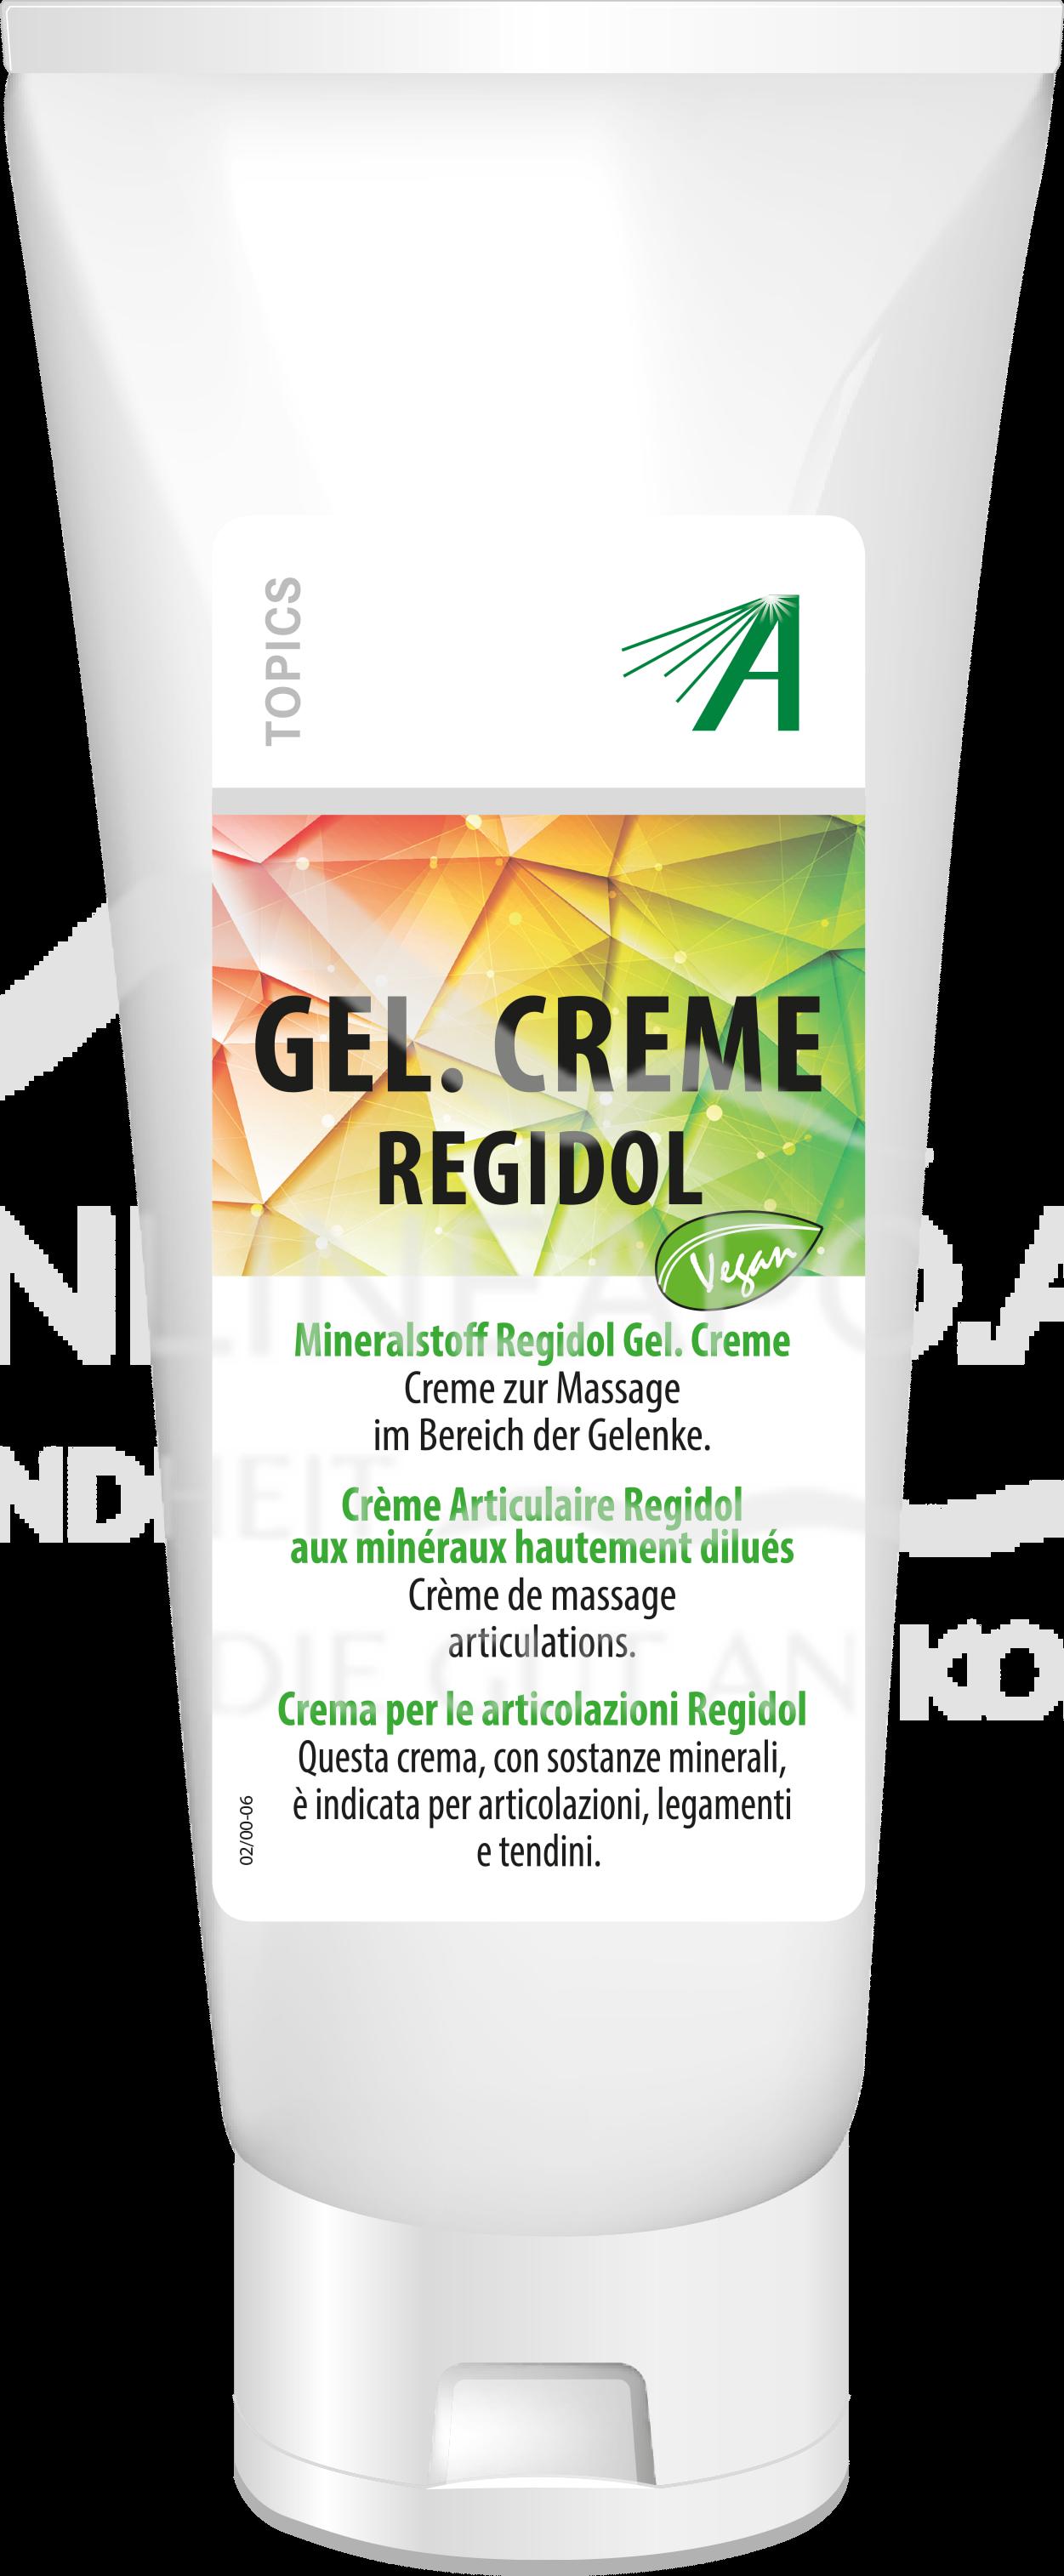 Adler Gel. Creme Regidol